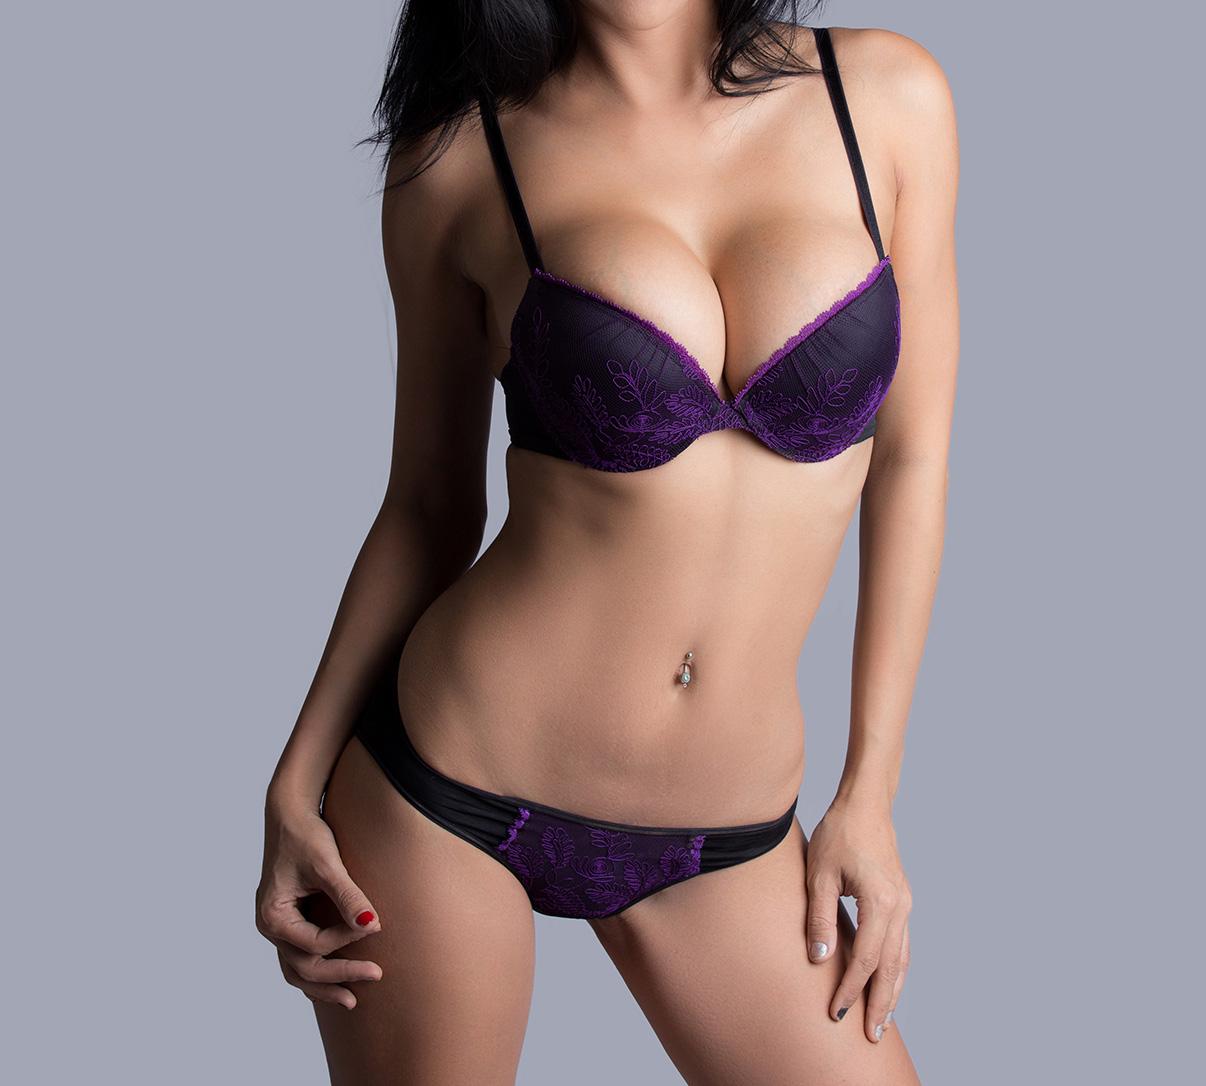 Breast augmentation photos silicone